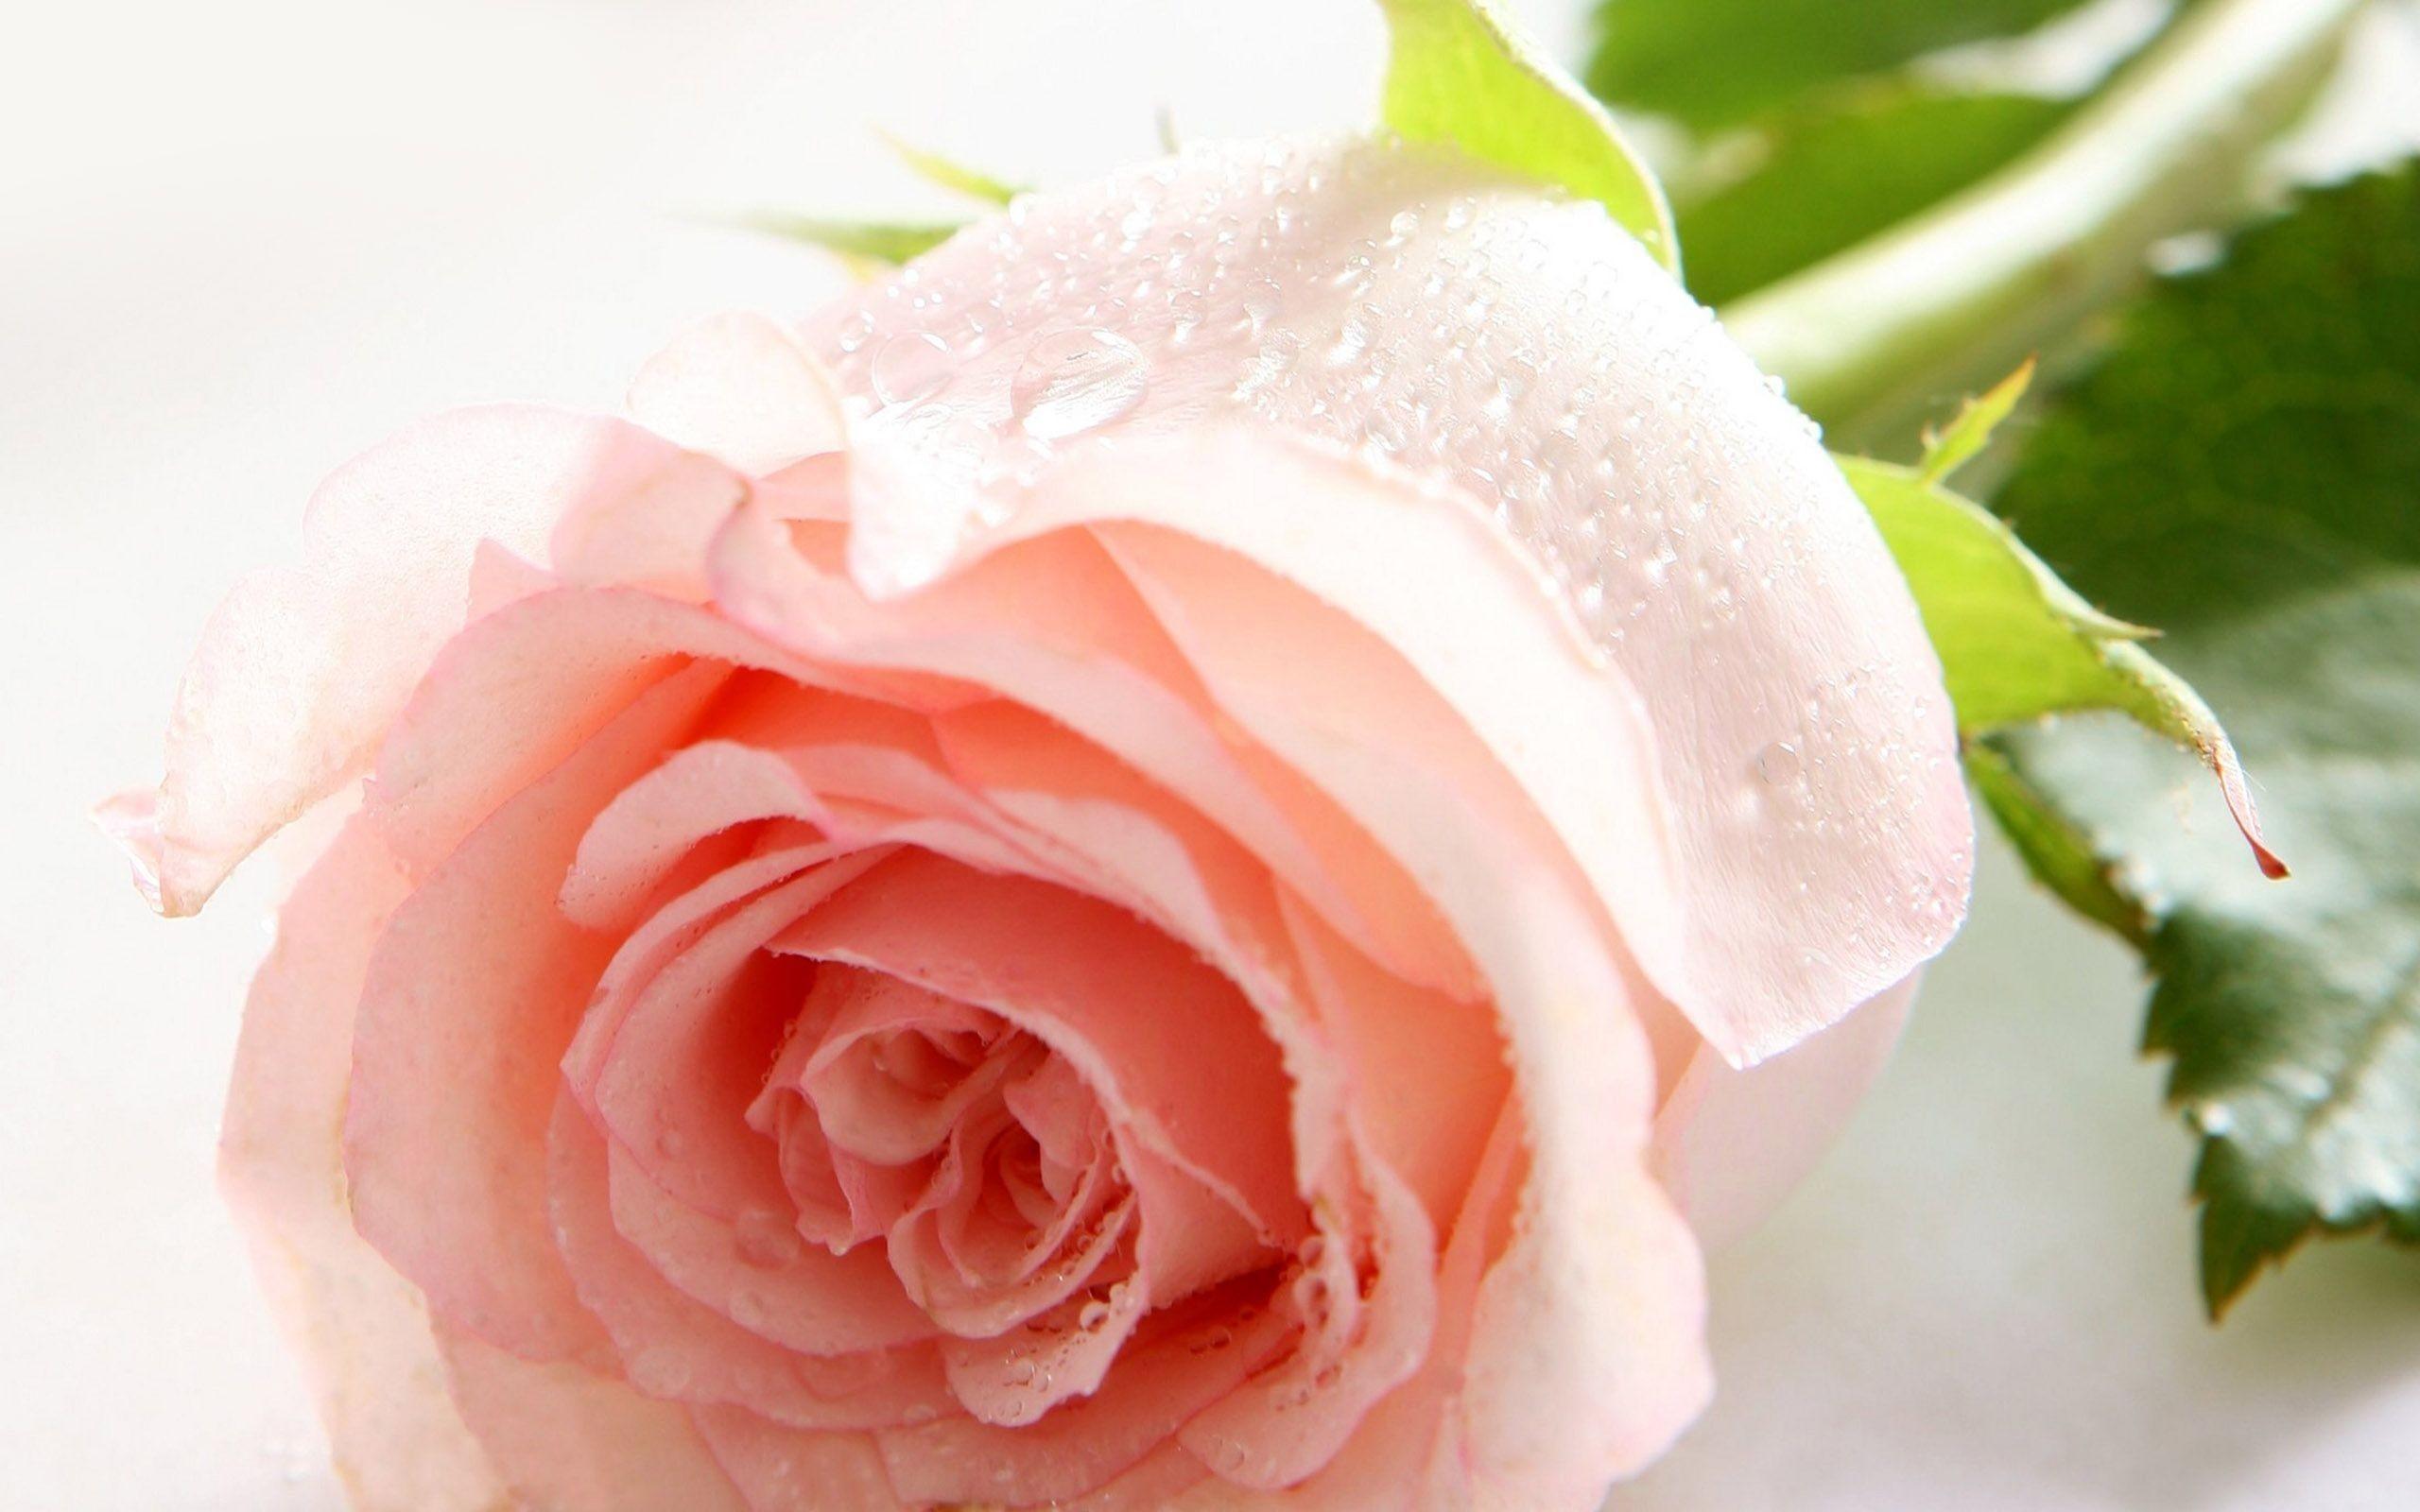 2560x1600 Rose Flower Wallpapers HD Wallpaper